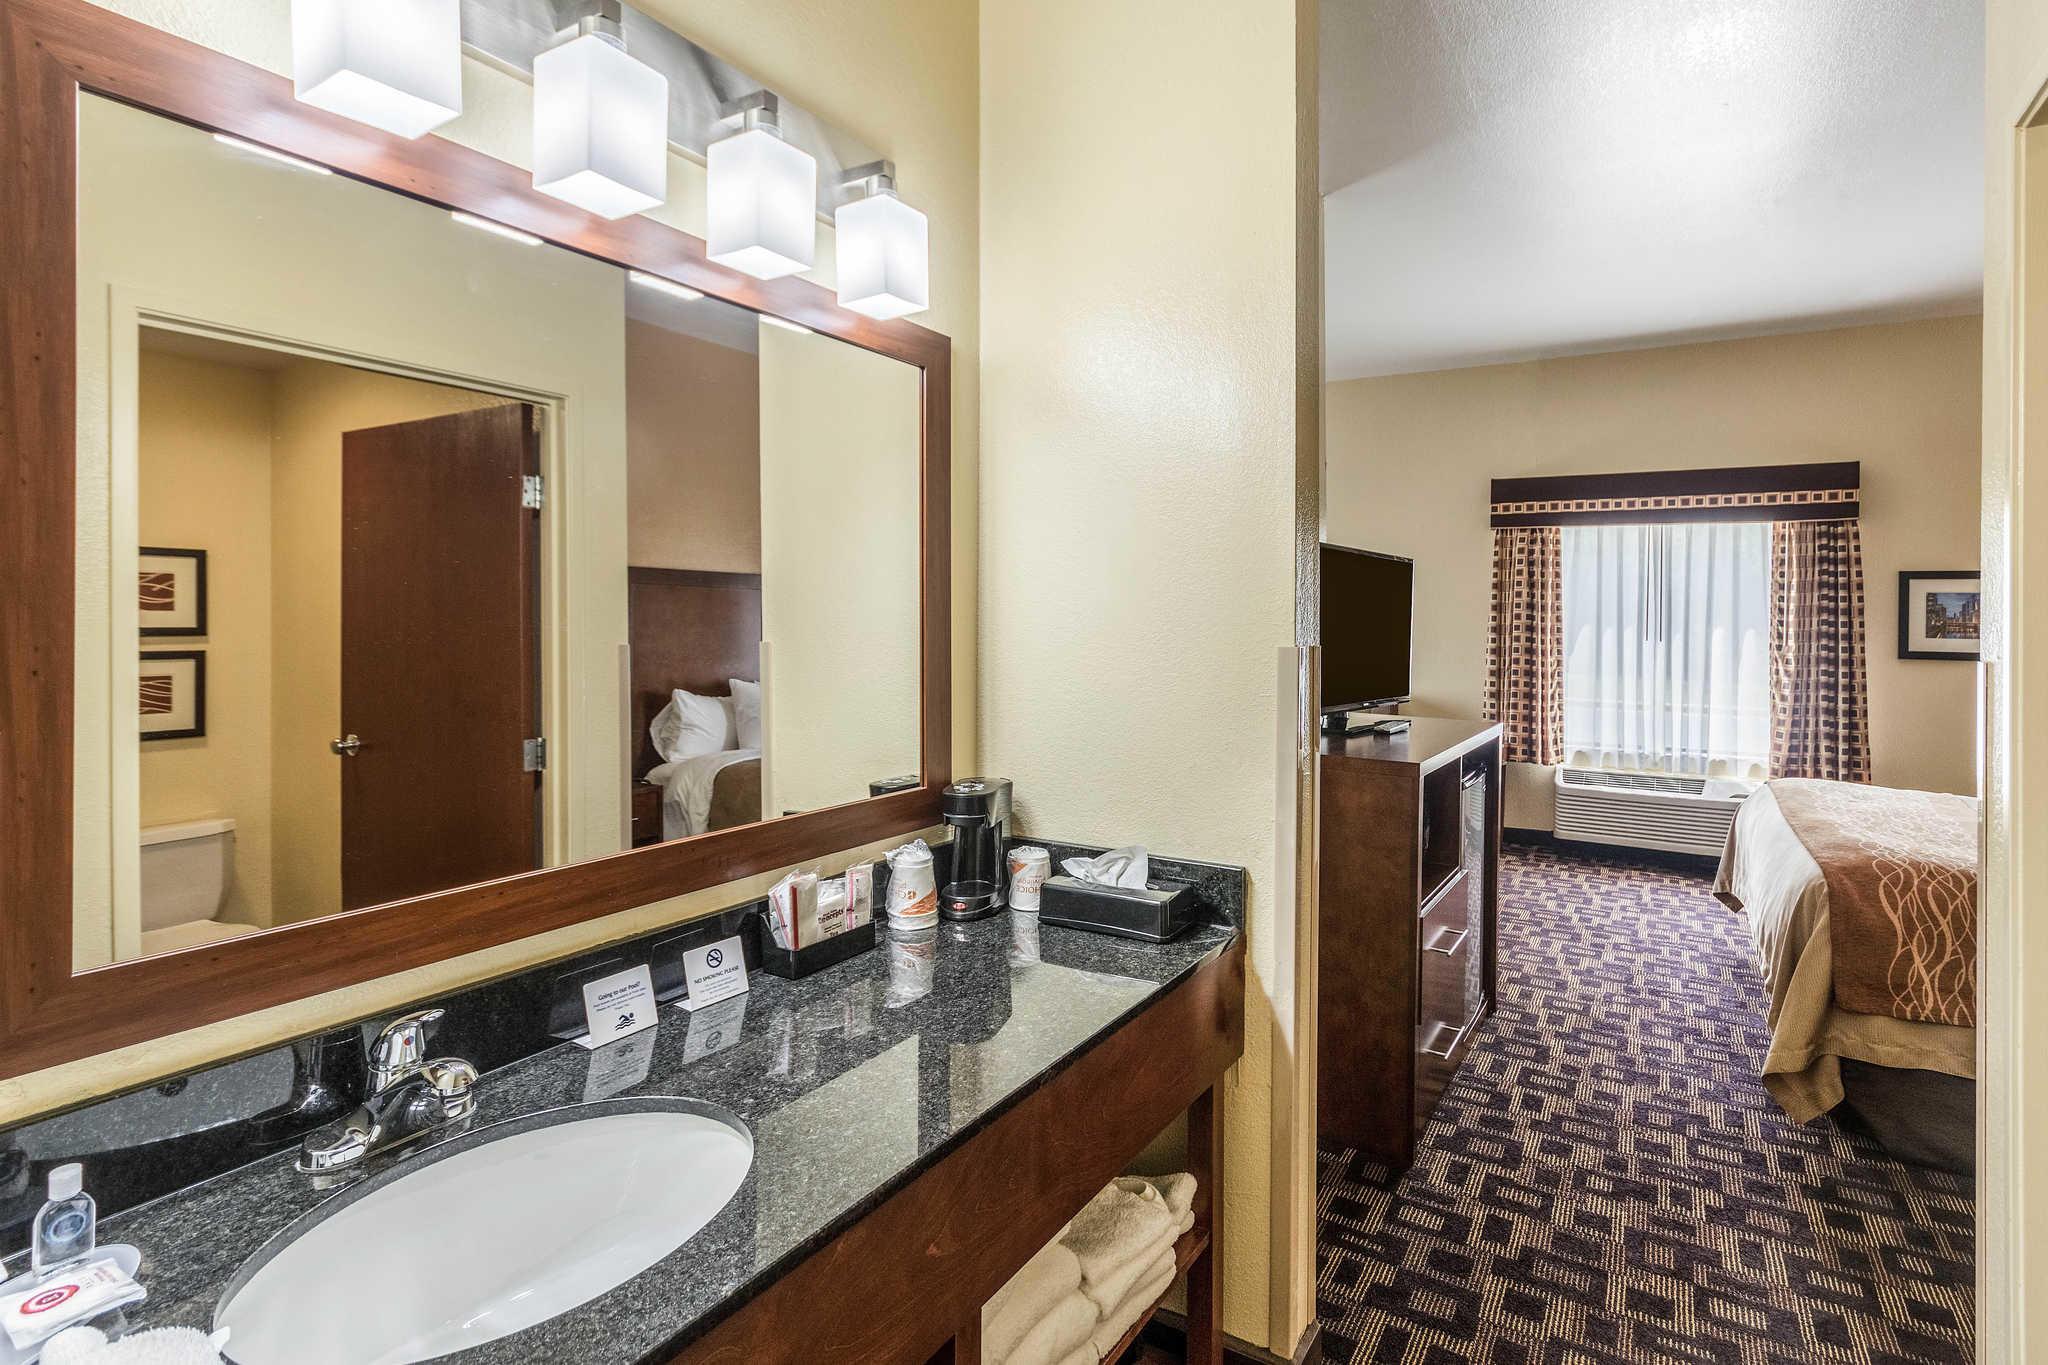 Comfort Inn & Suites North Aurora - Naperville image 30